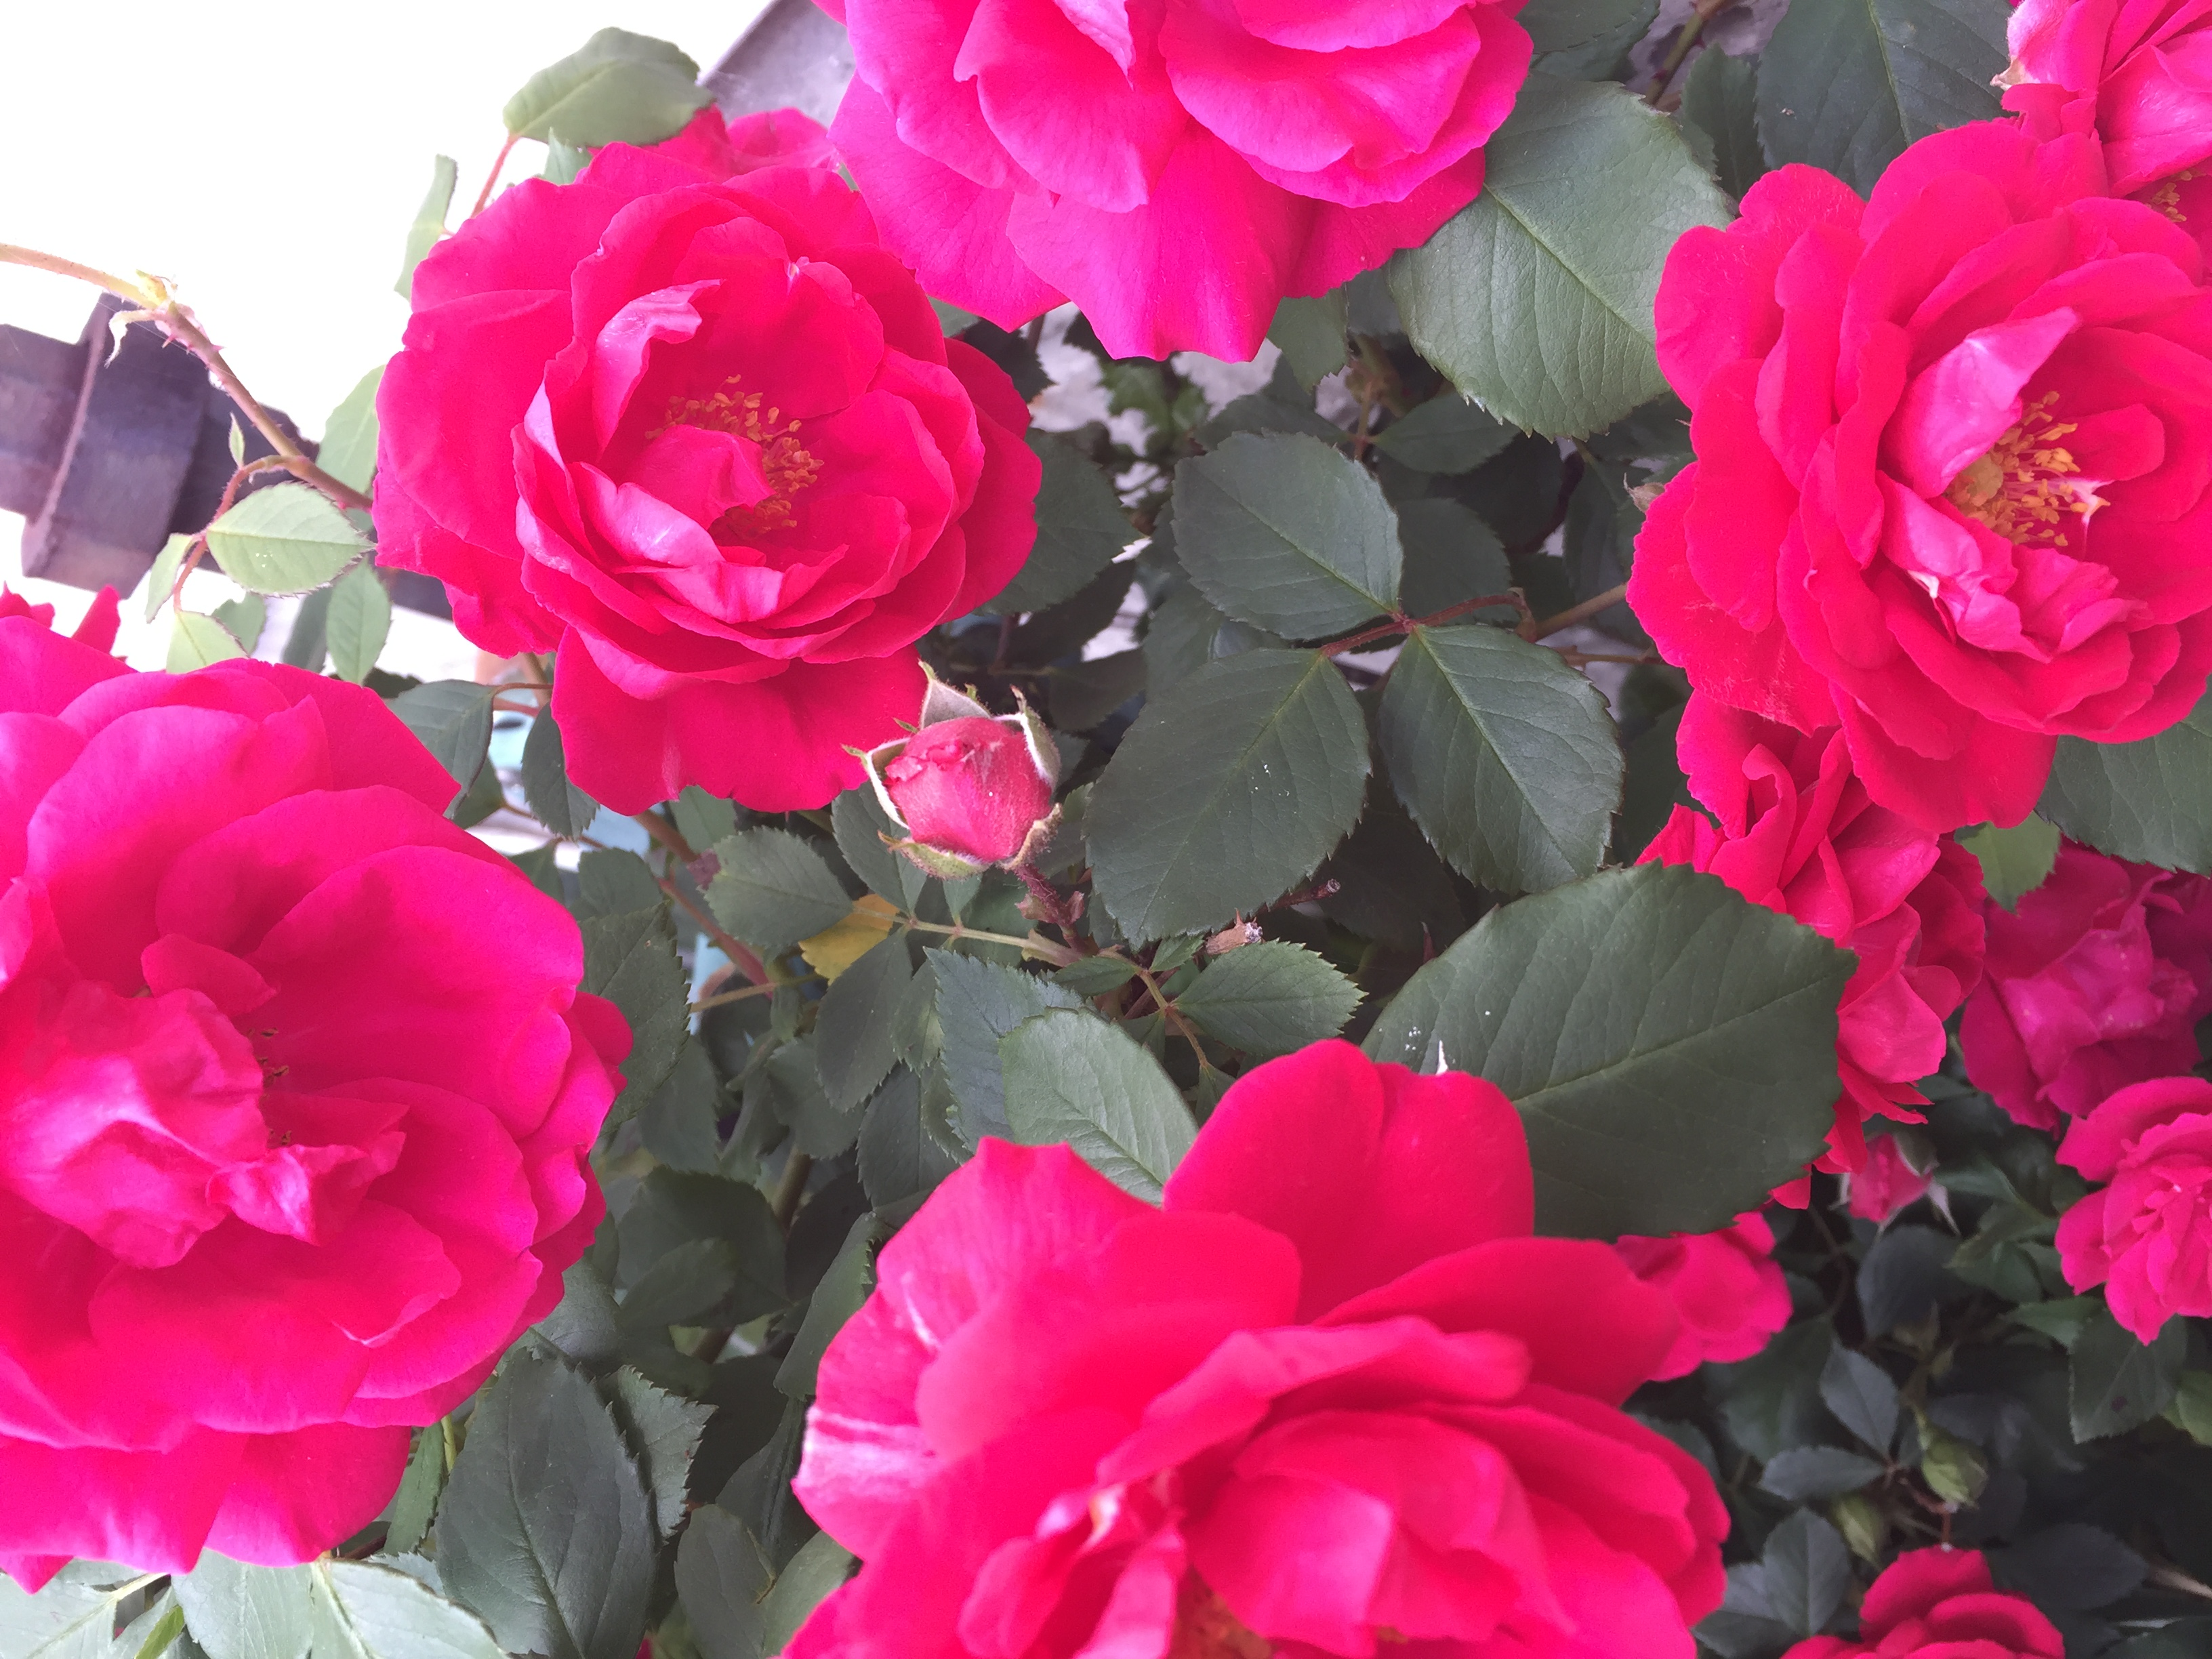 7CE4BB4A 756F 43C8 98DC CA74756B164D Irises, Roses, and Azaleas — Oh My!